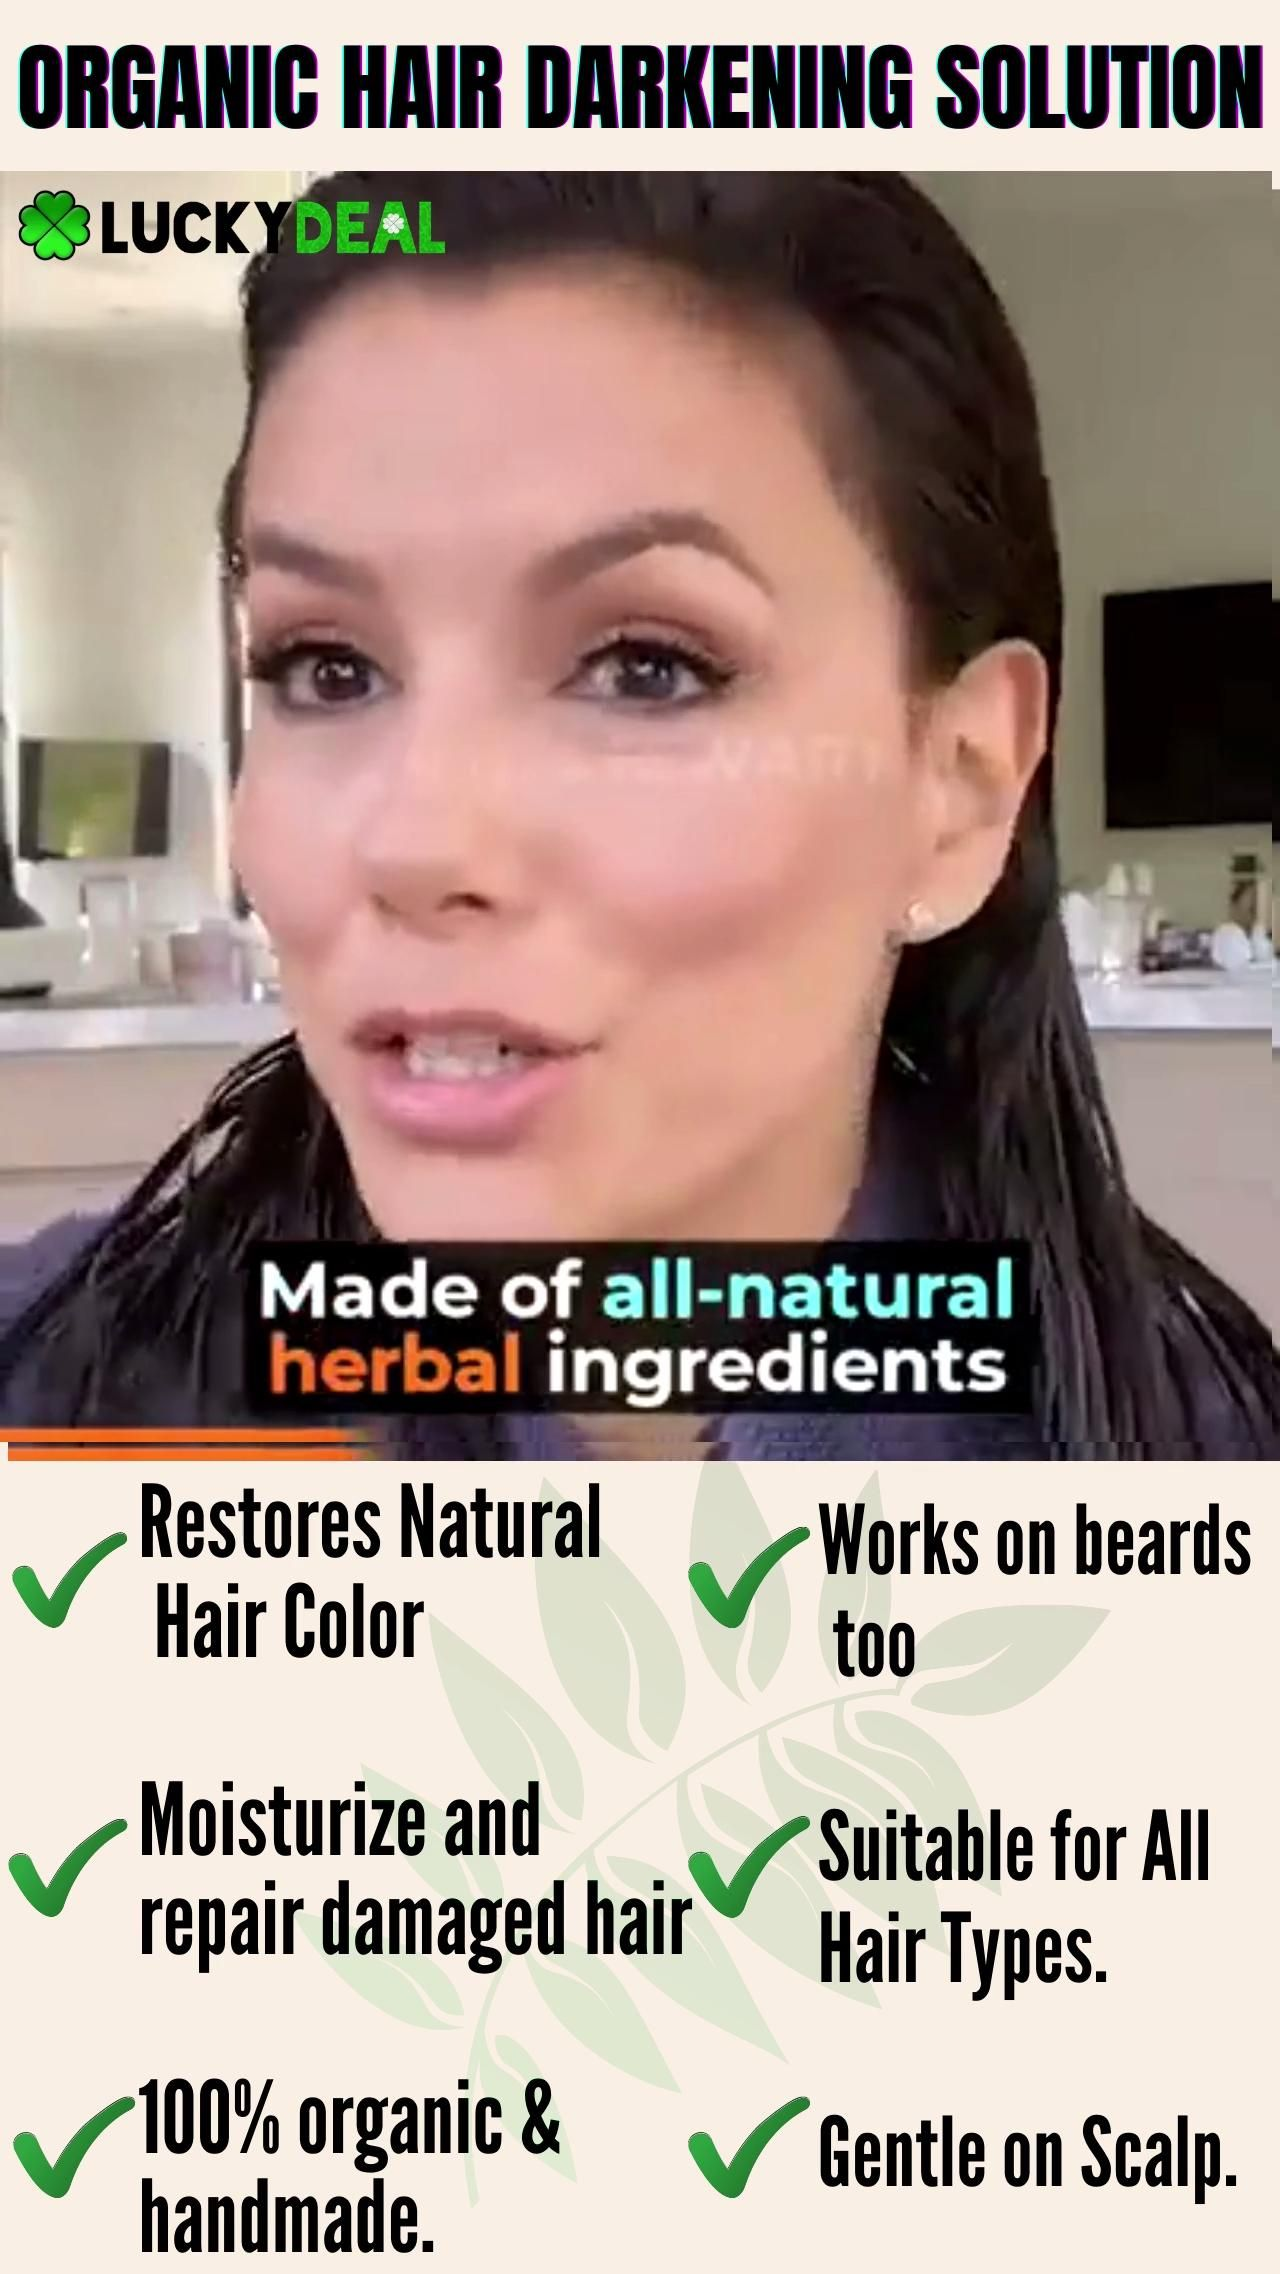 😍No more dye to cover grey hair! 100% Handmade & O